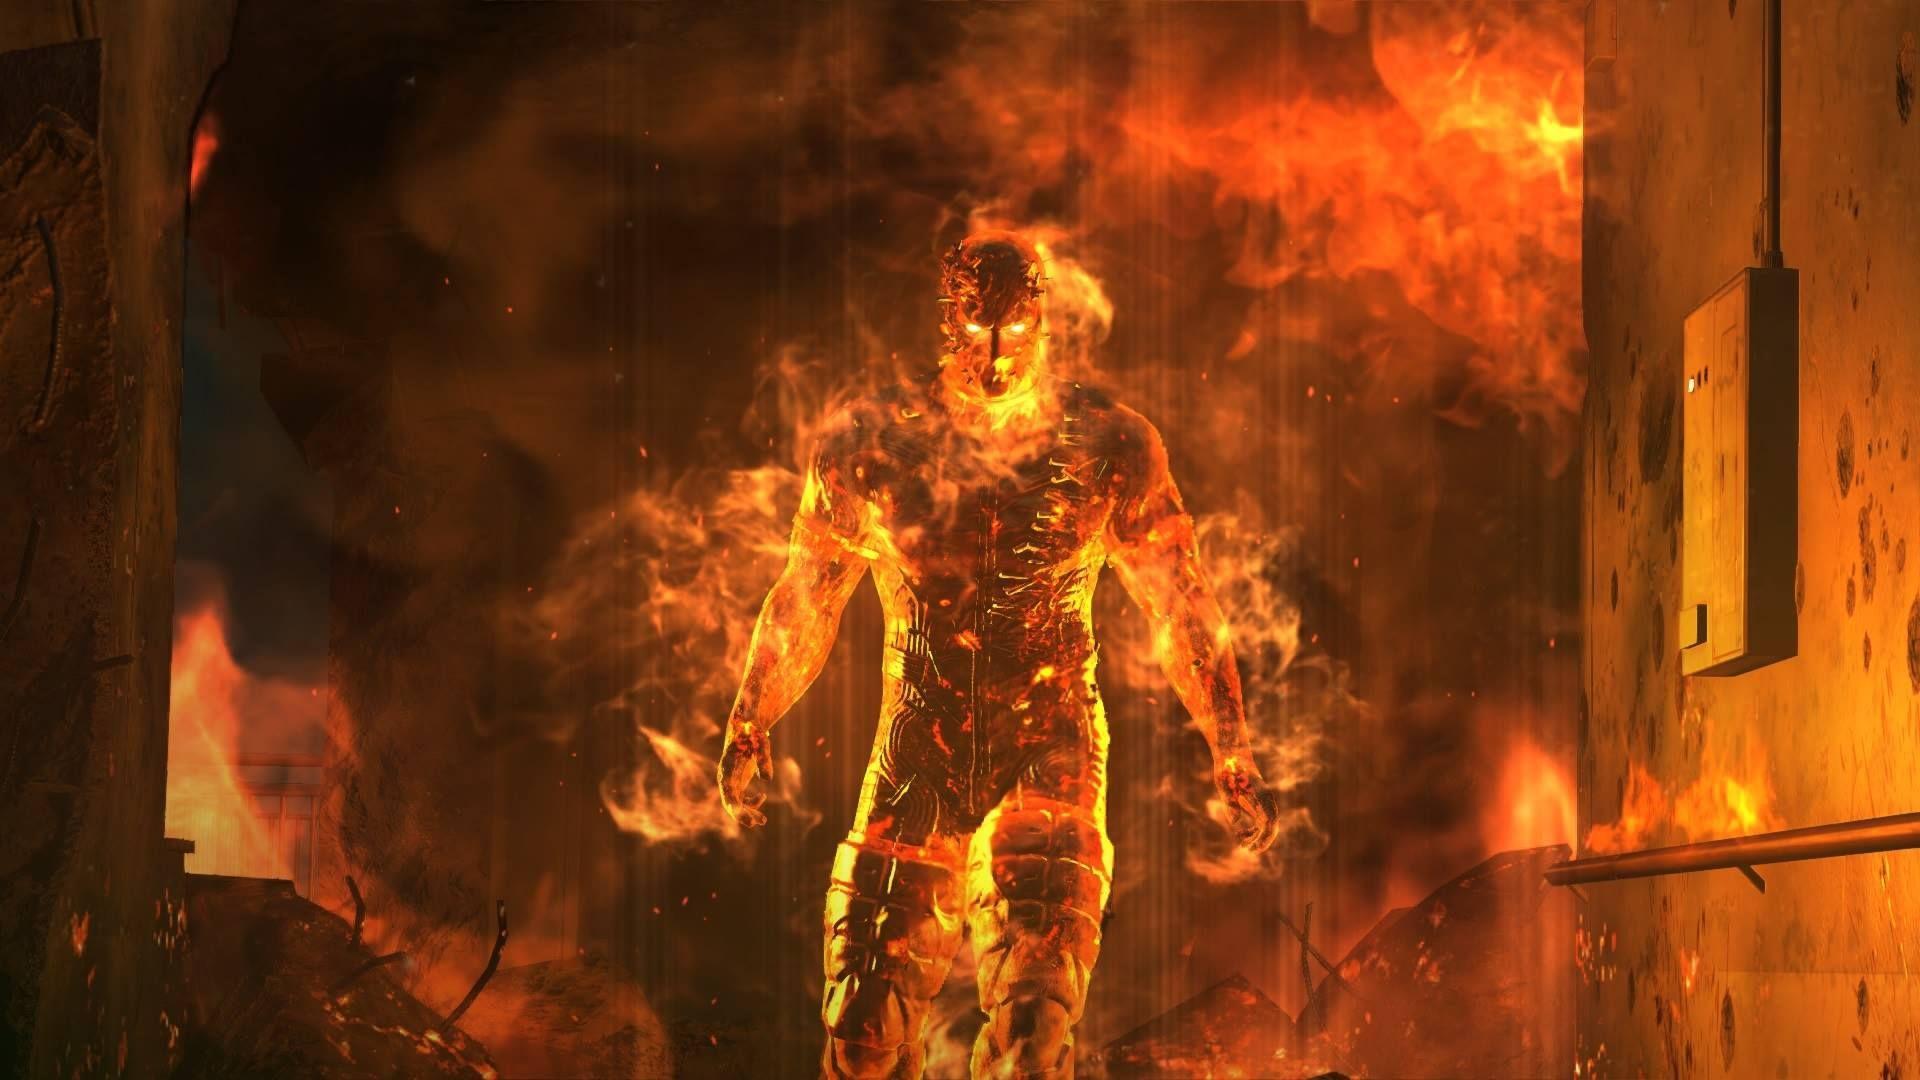 The Man On Fire Metal Gear Solid V The Phantom Pain Metalgearsolidv Thephantompain Ps4share